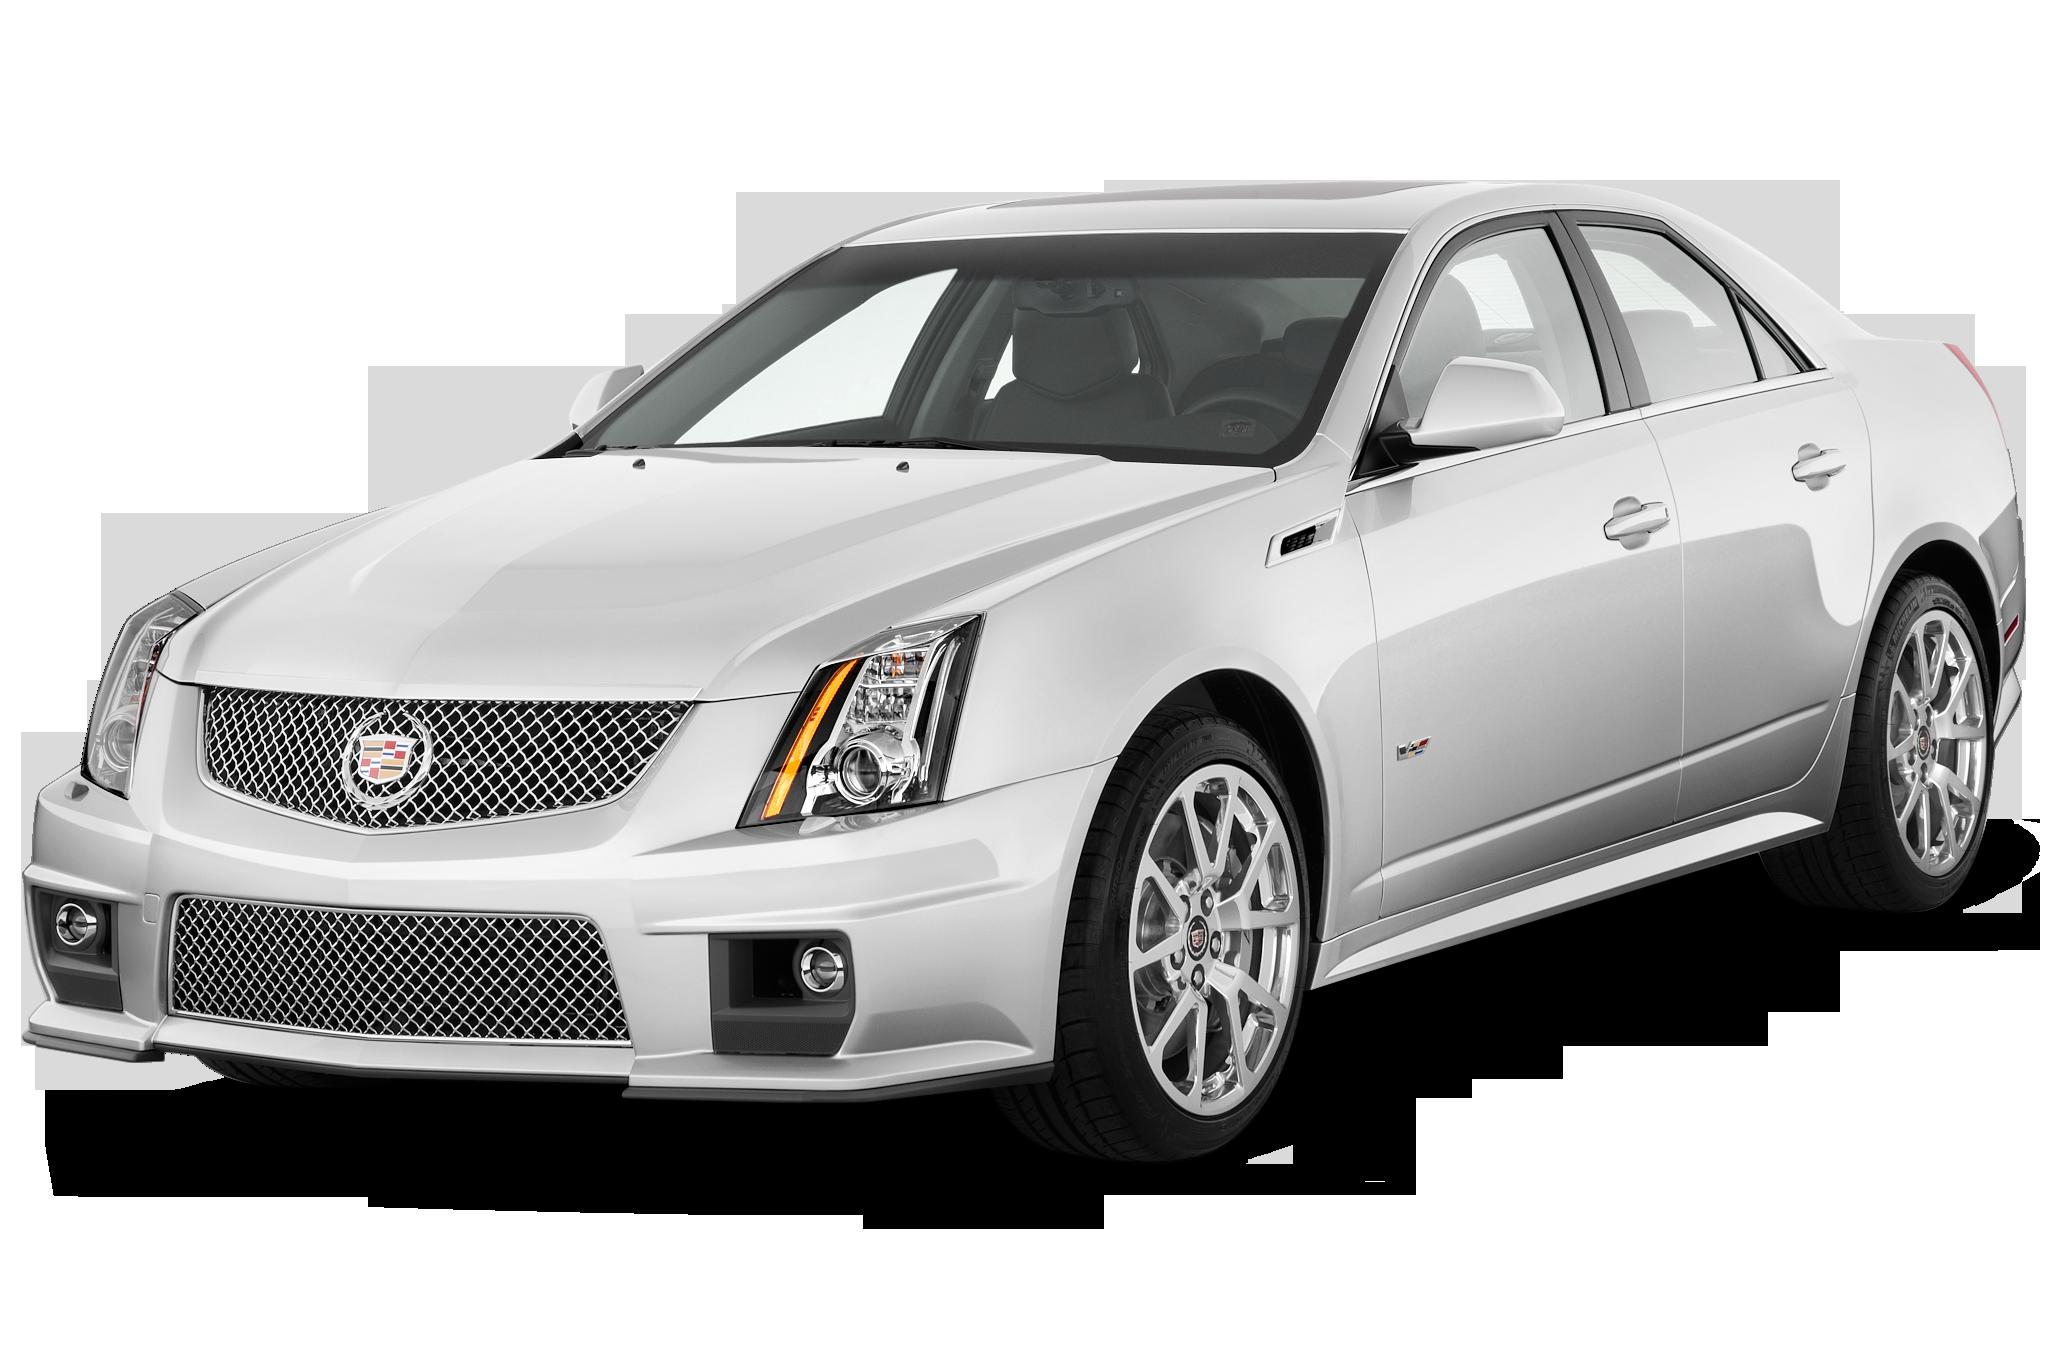 2010 Cadillac CTS Wagon Premium  Editors Notebook  Automobile